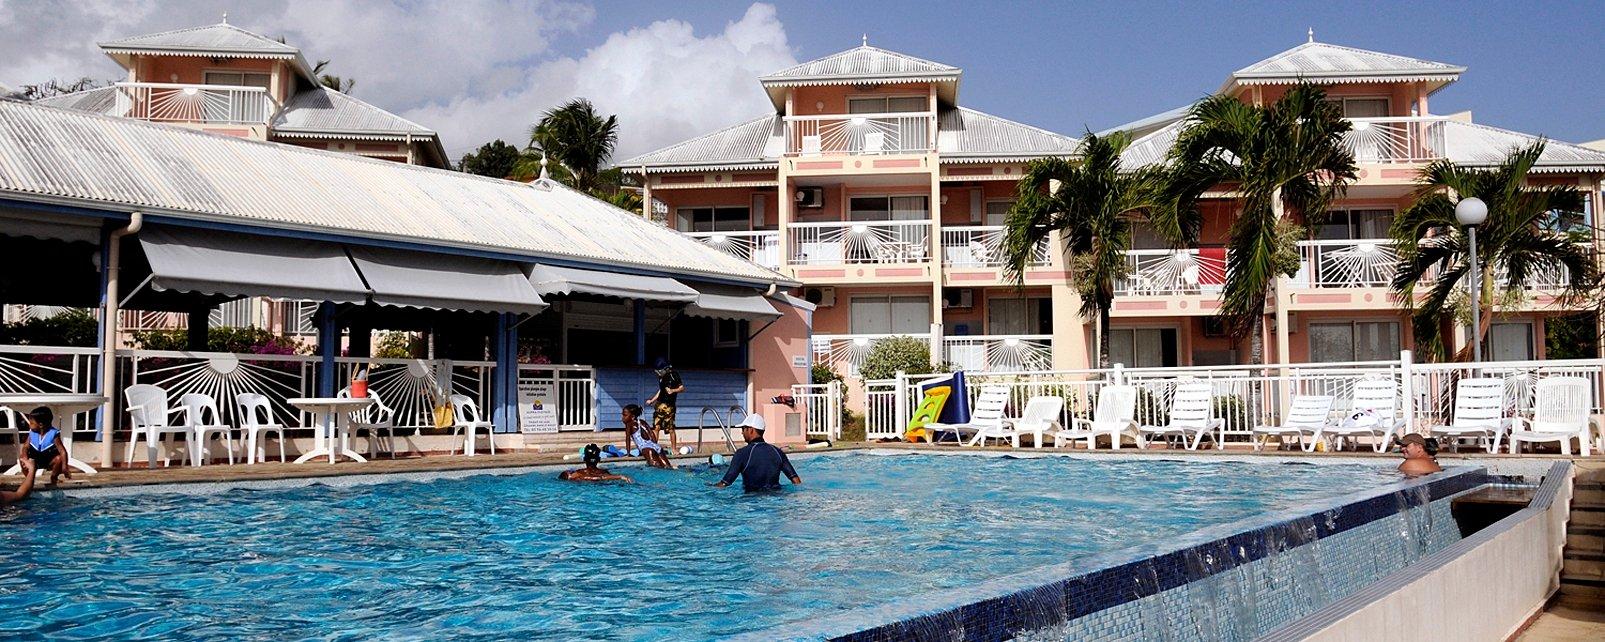 Hôtel Résidence Diamant Beach